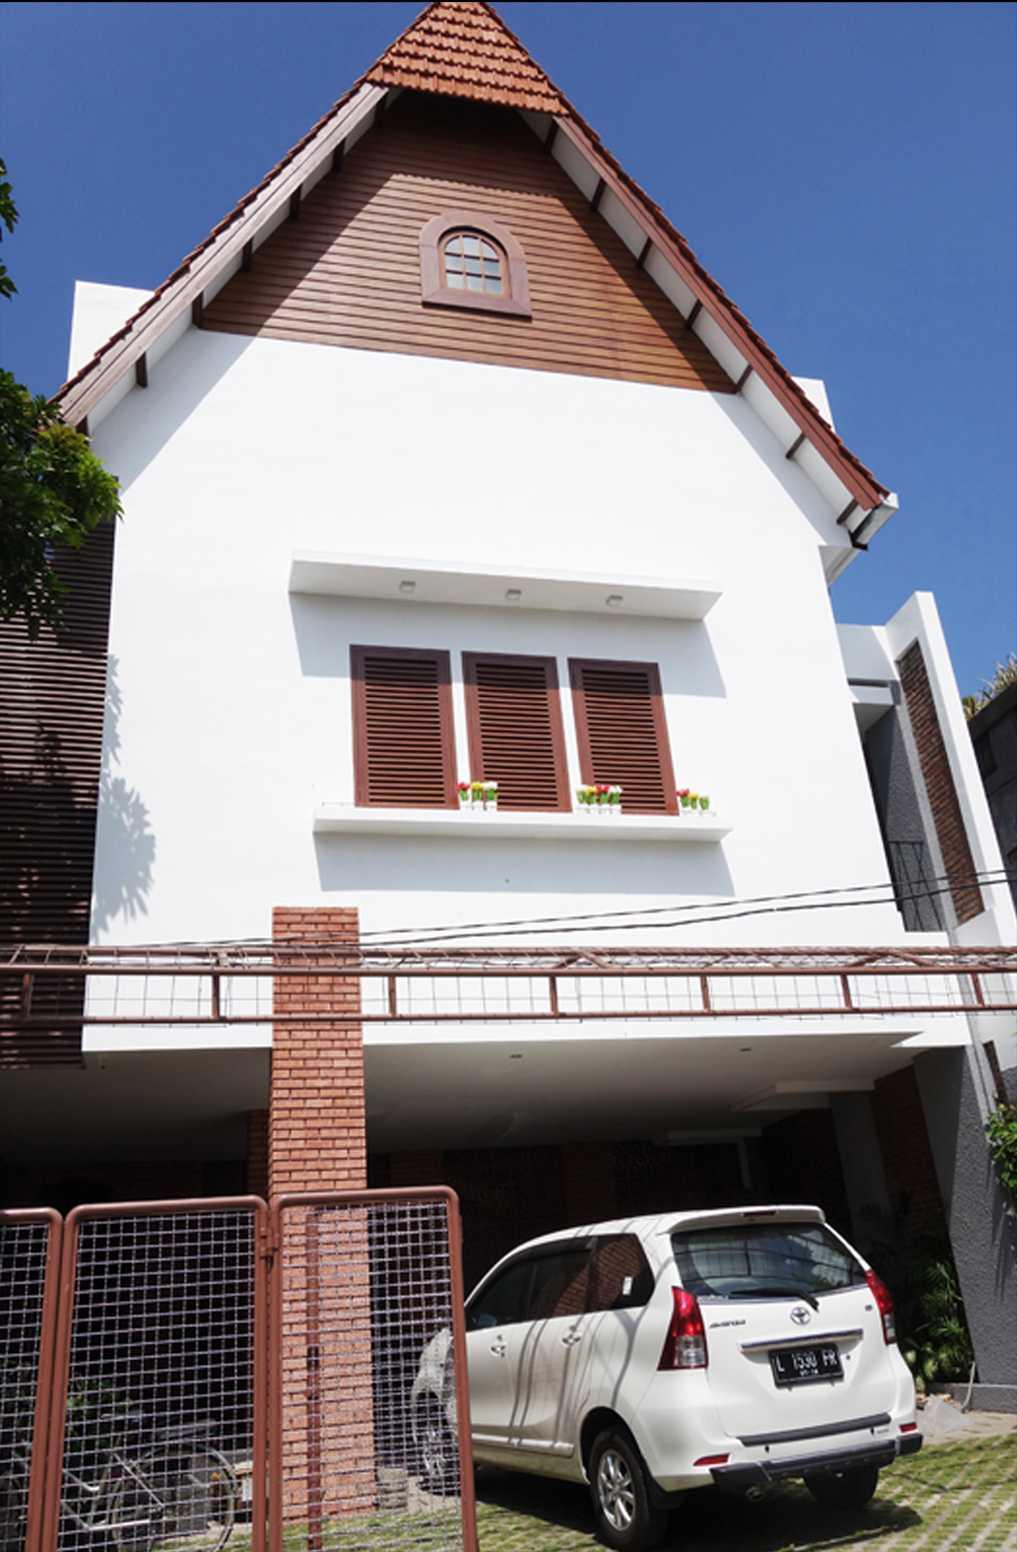 Bral Architect Sabaya House Surabaya City, East Java, Indonesia Surabaya Facade Klasik  24888